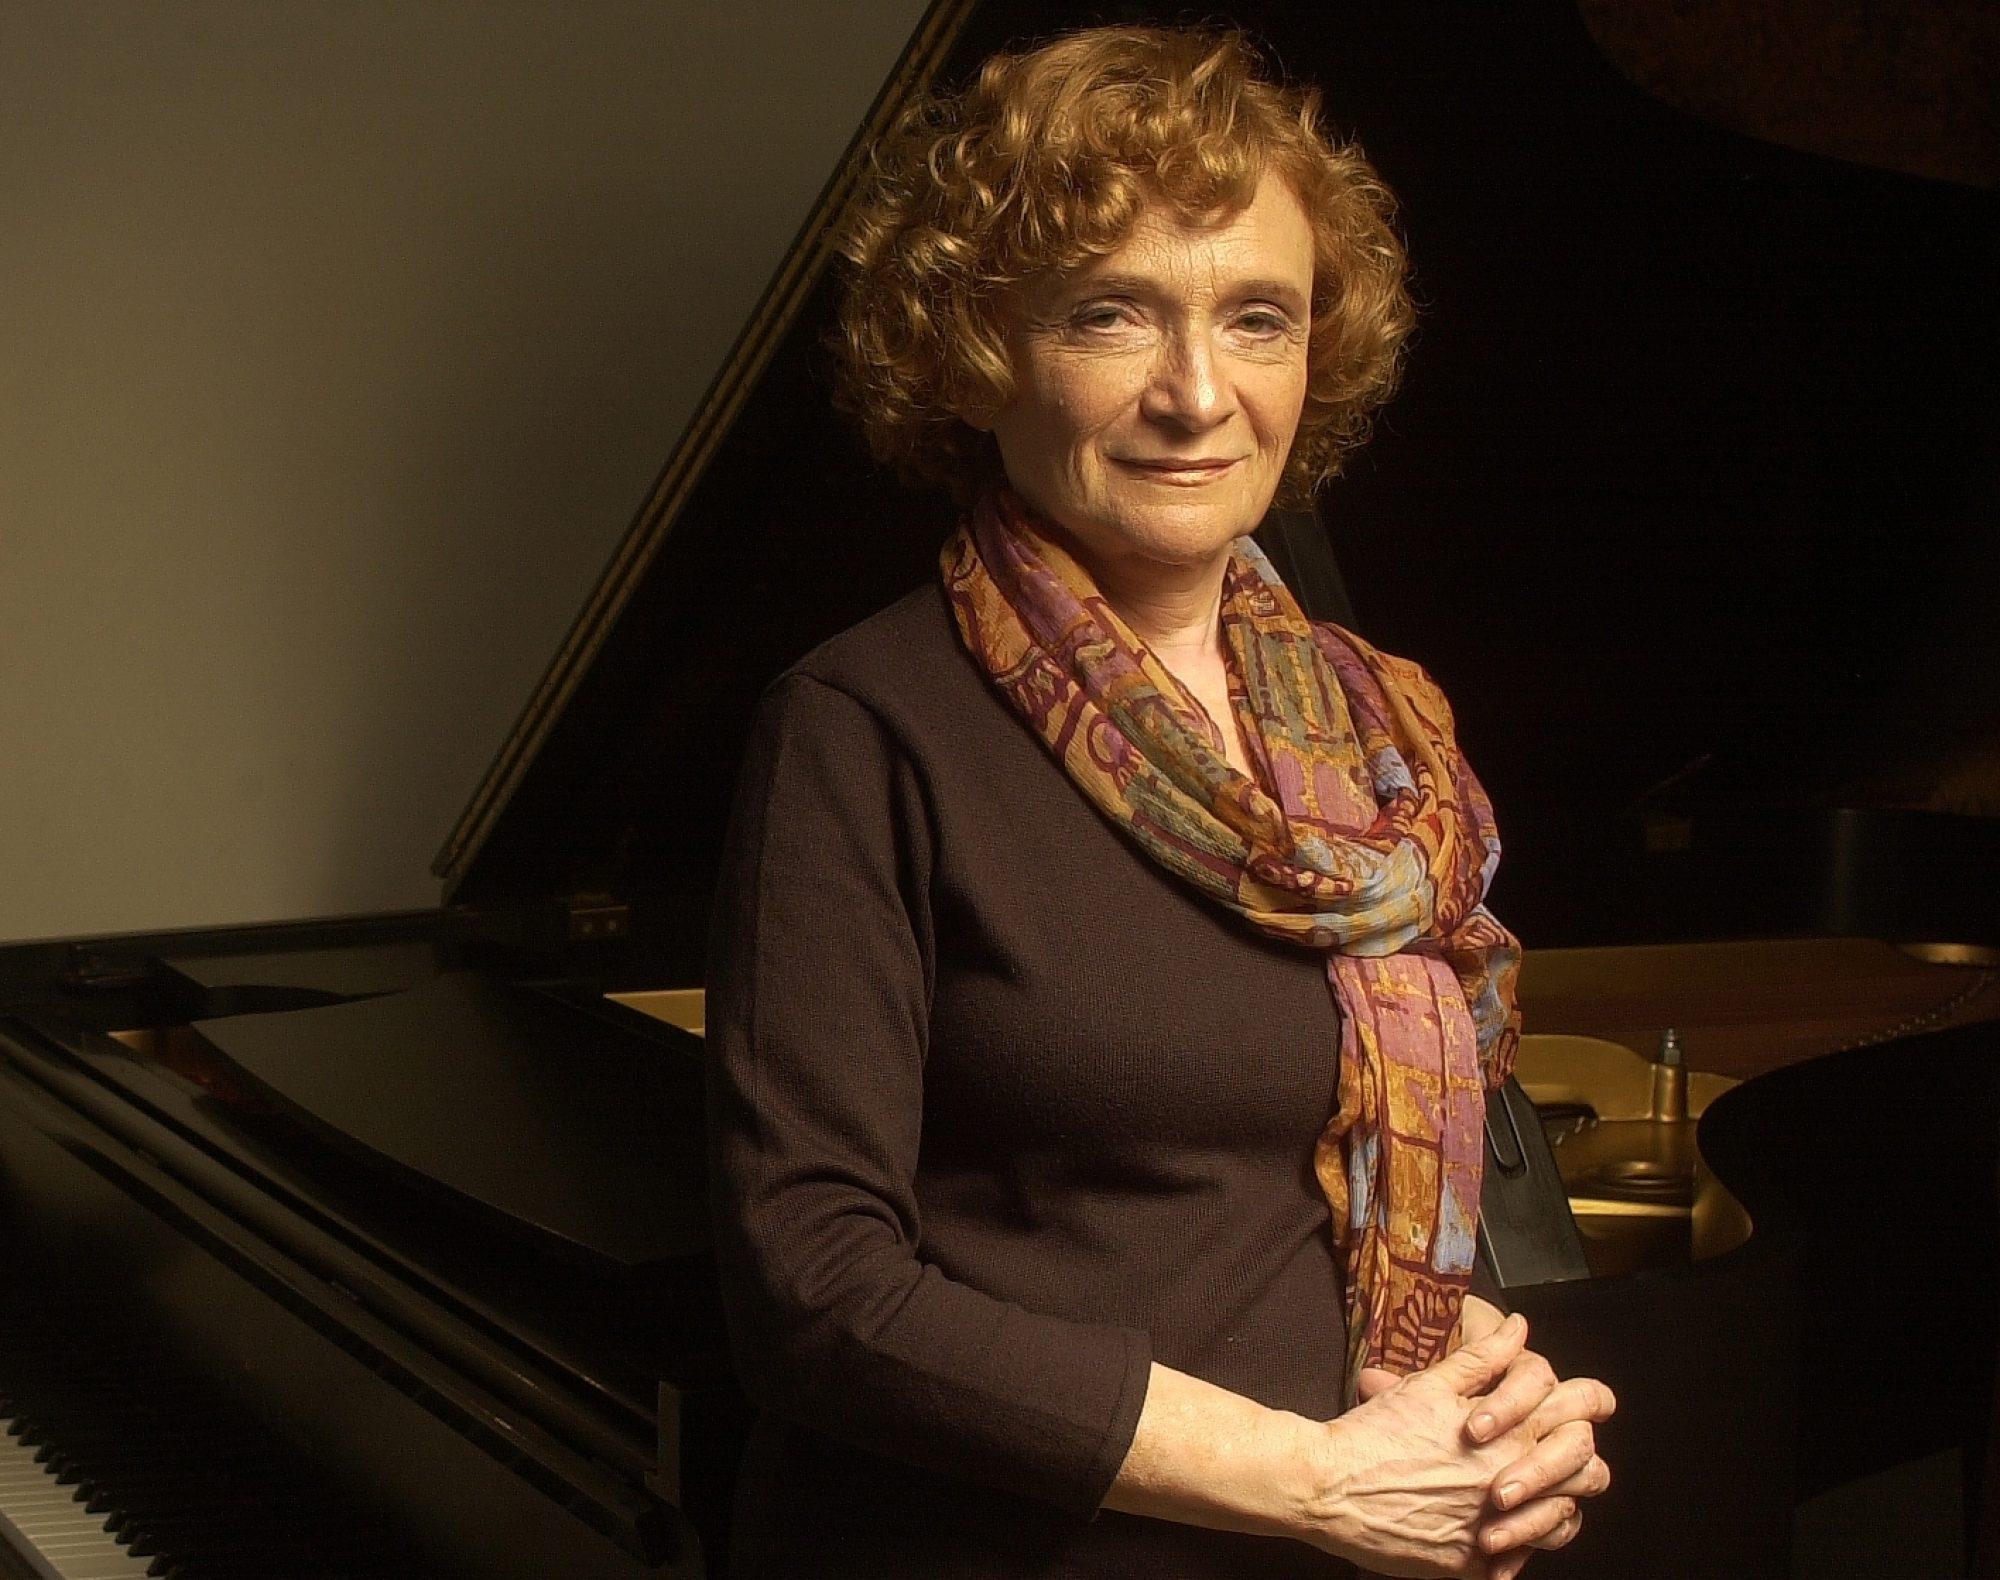 Clara Sverner